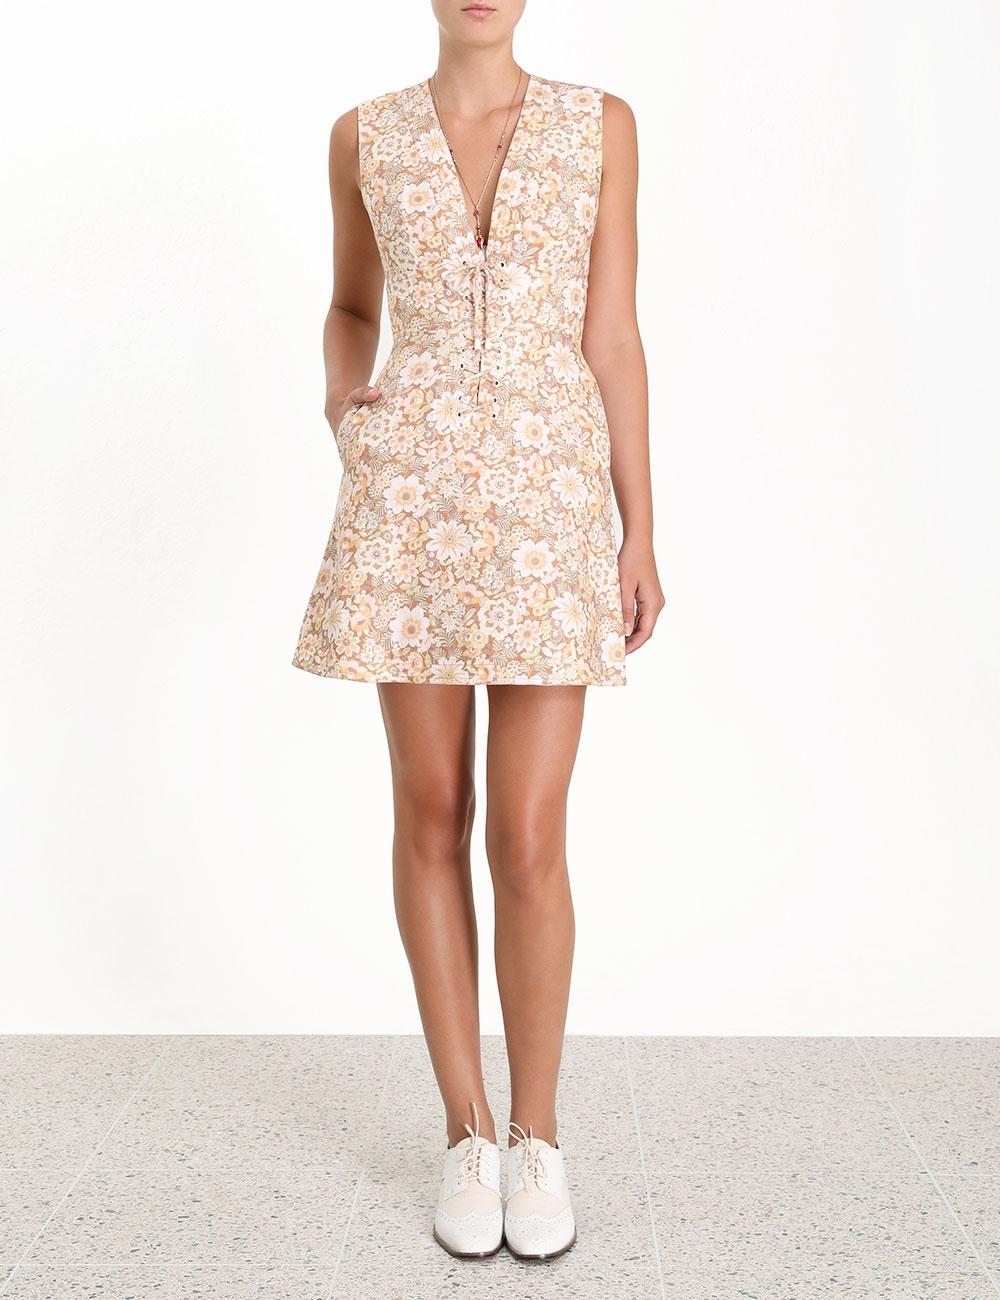 Zippy Lace Up Short Dress